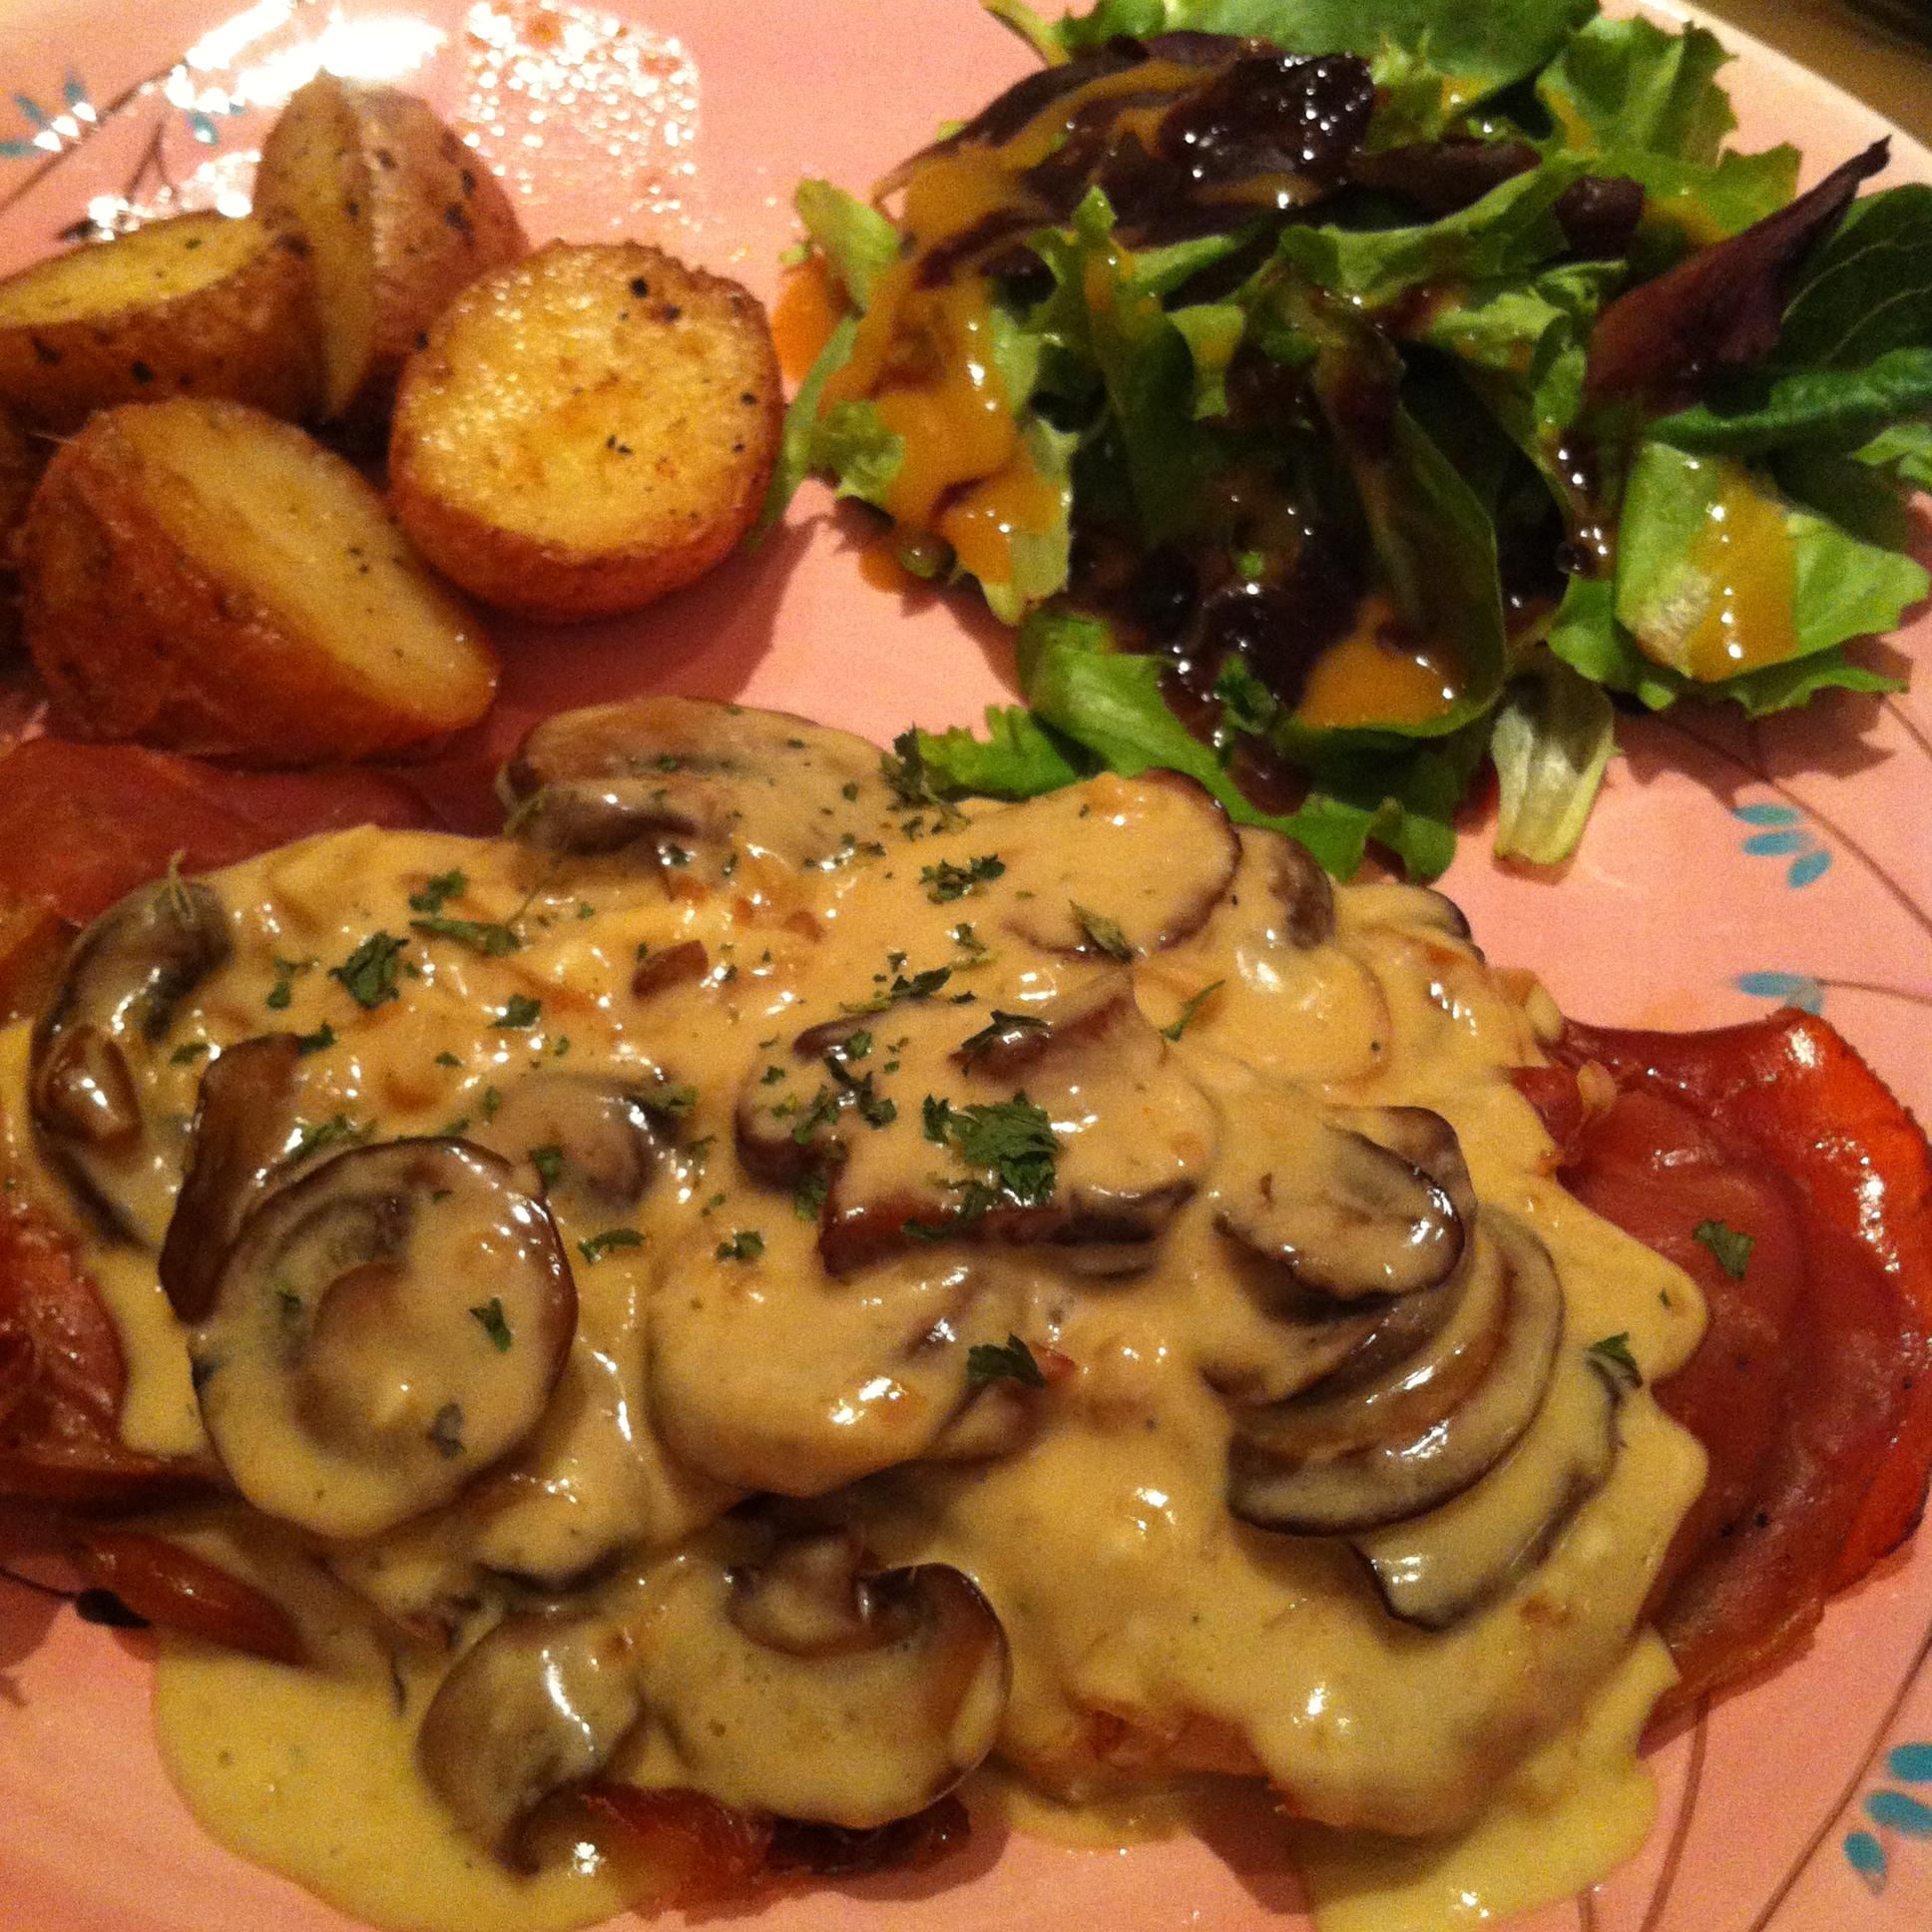 Black recipes for boneless chicken breast